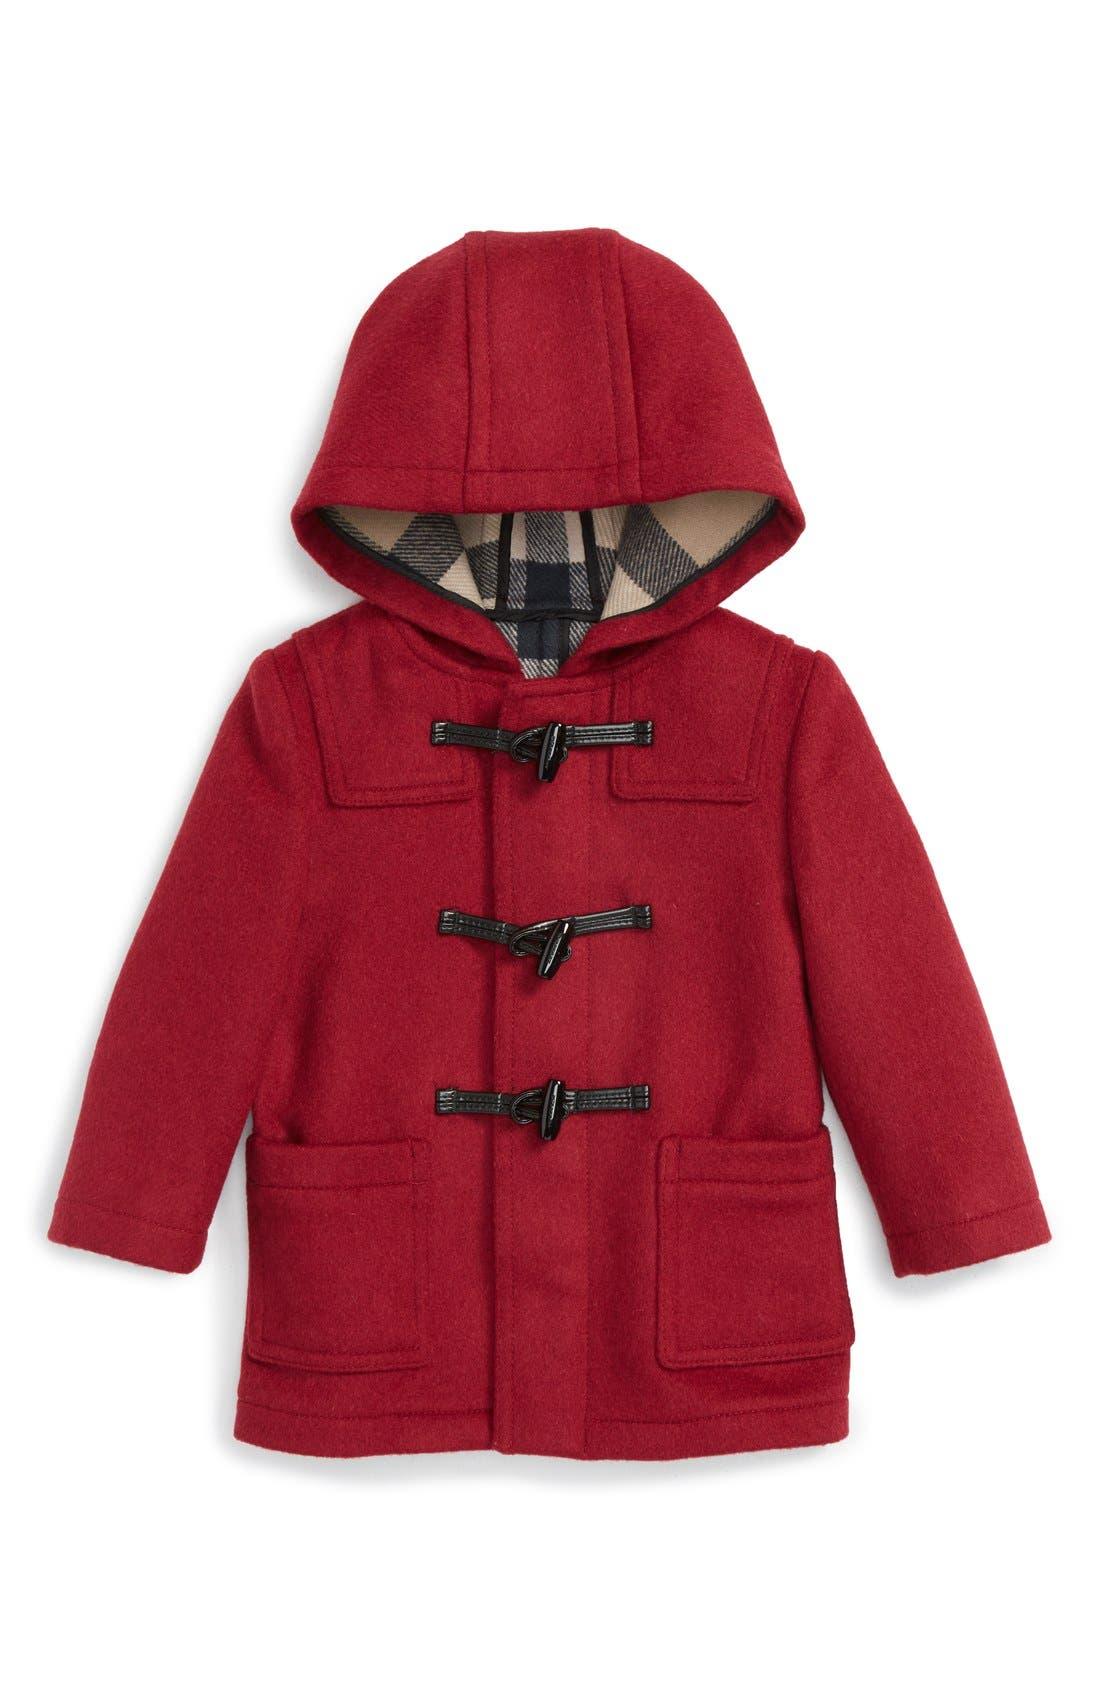 Main Image - Burberry 'Brogan' Hooded Wool Toggle Coat (Baby Girls)